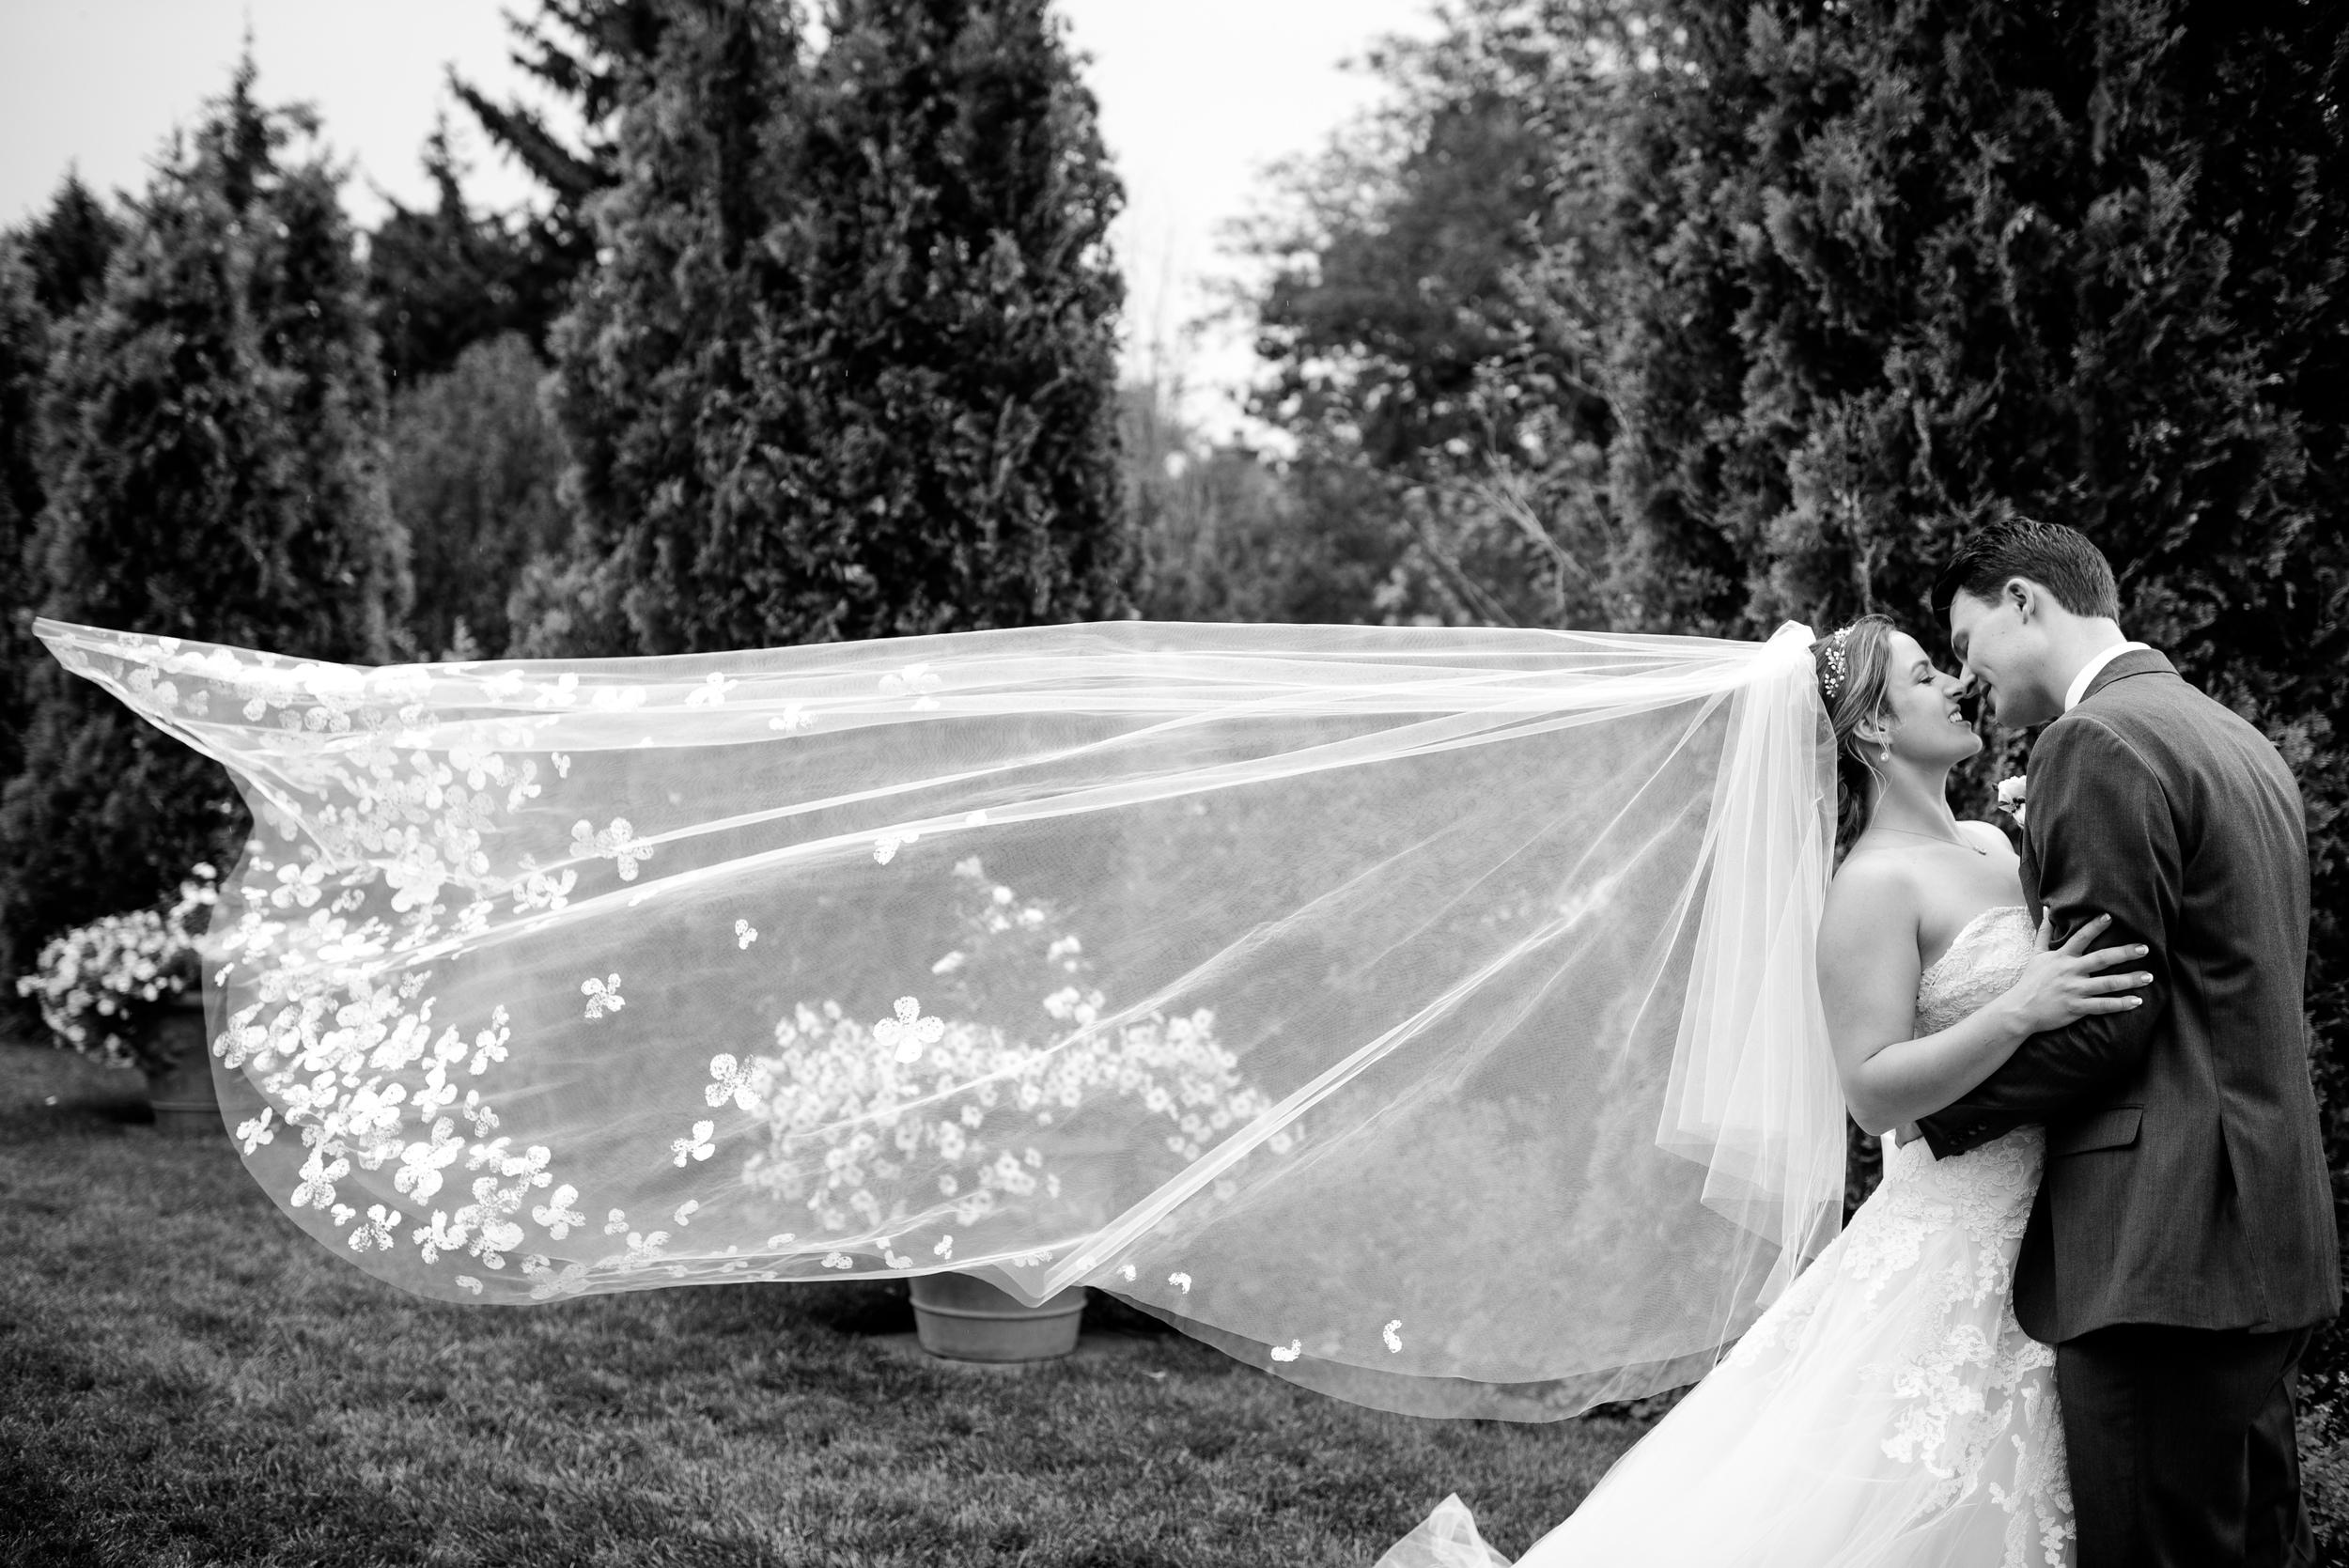 Denver Botanic Garden Wedding | Liancarlo gown from Little White Dress | Kara Pearson Photography